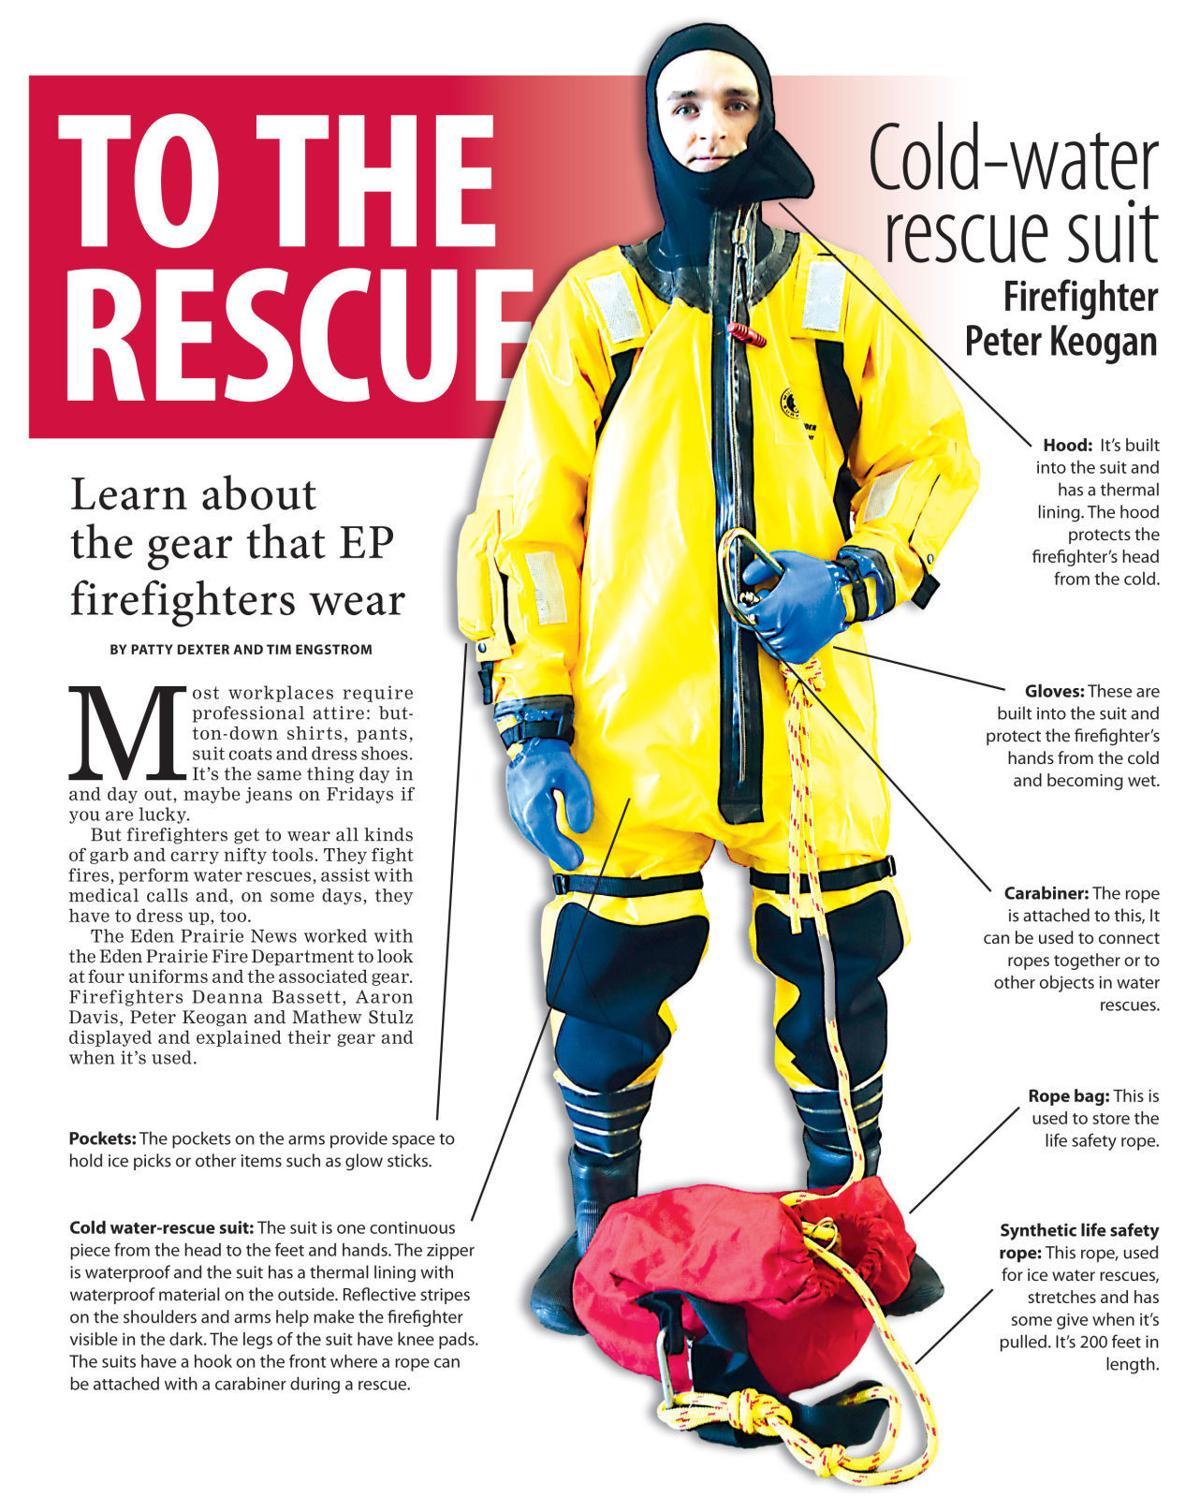 Learn about the gear the Eden Prairie firefighters wear